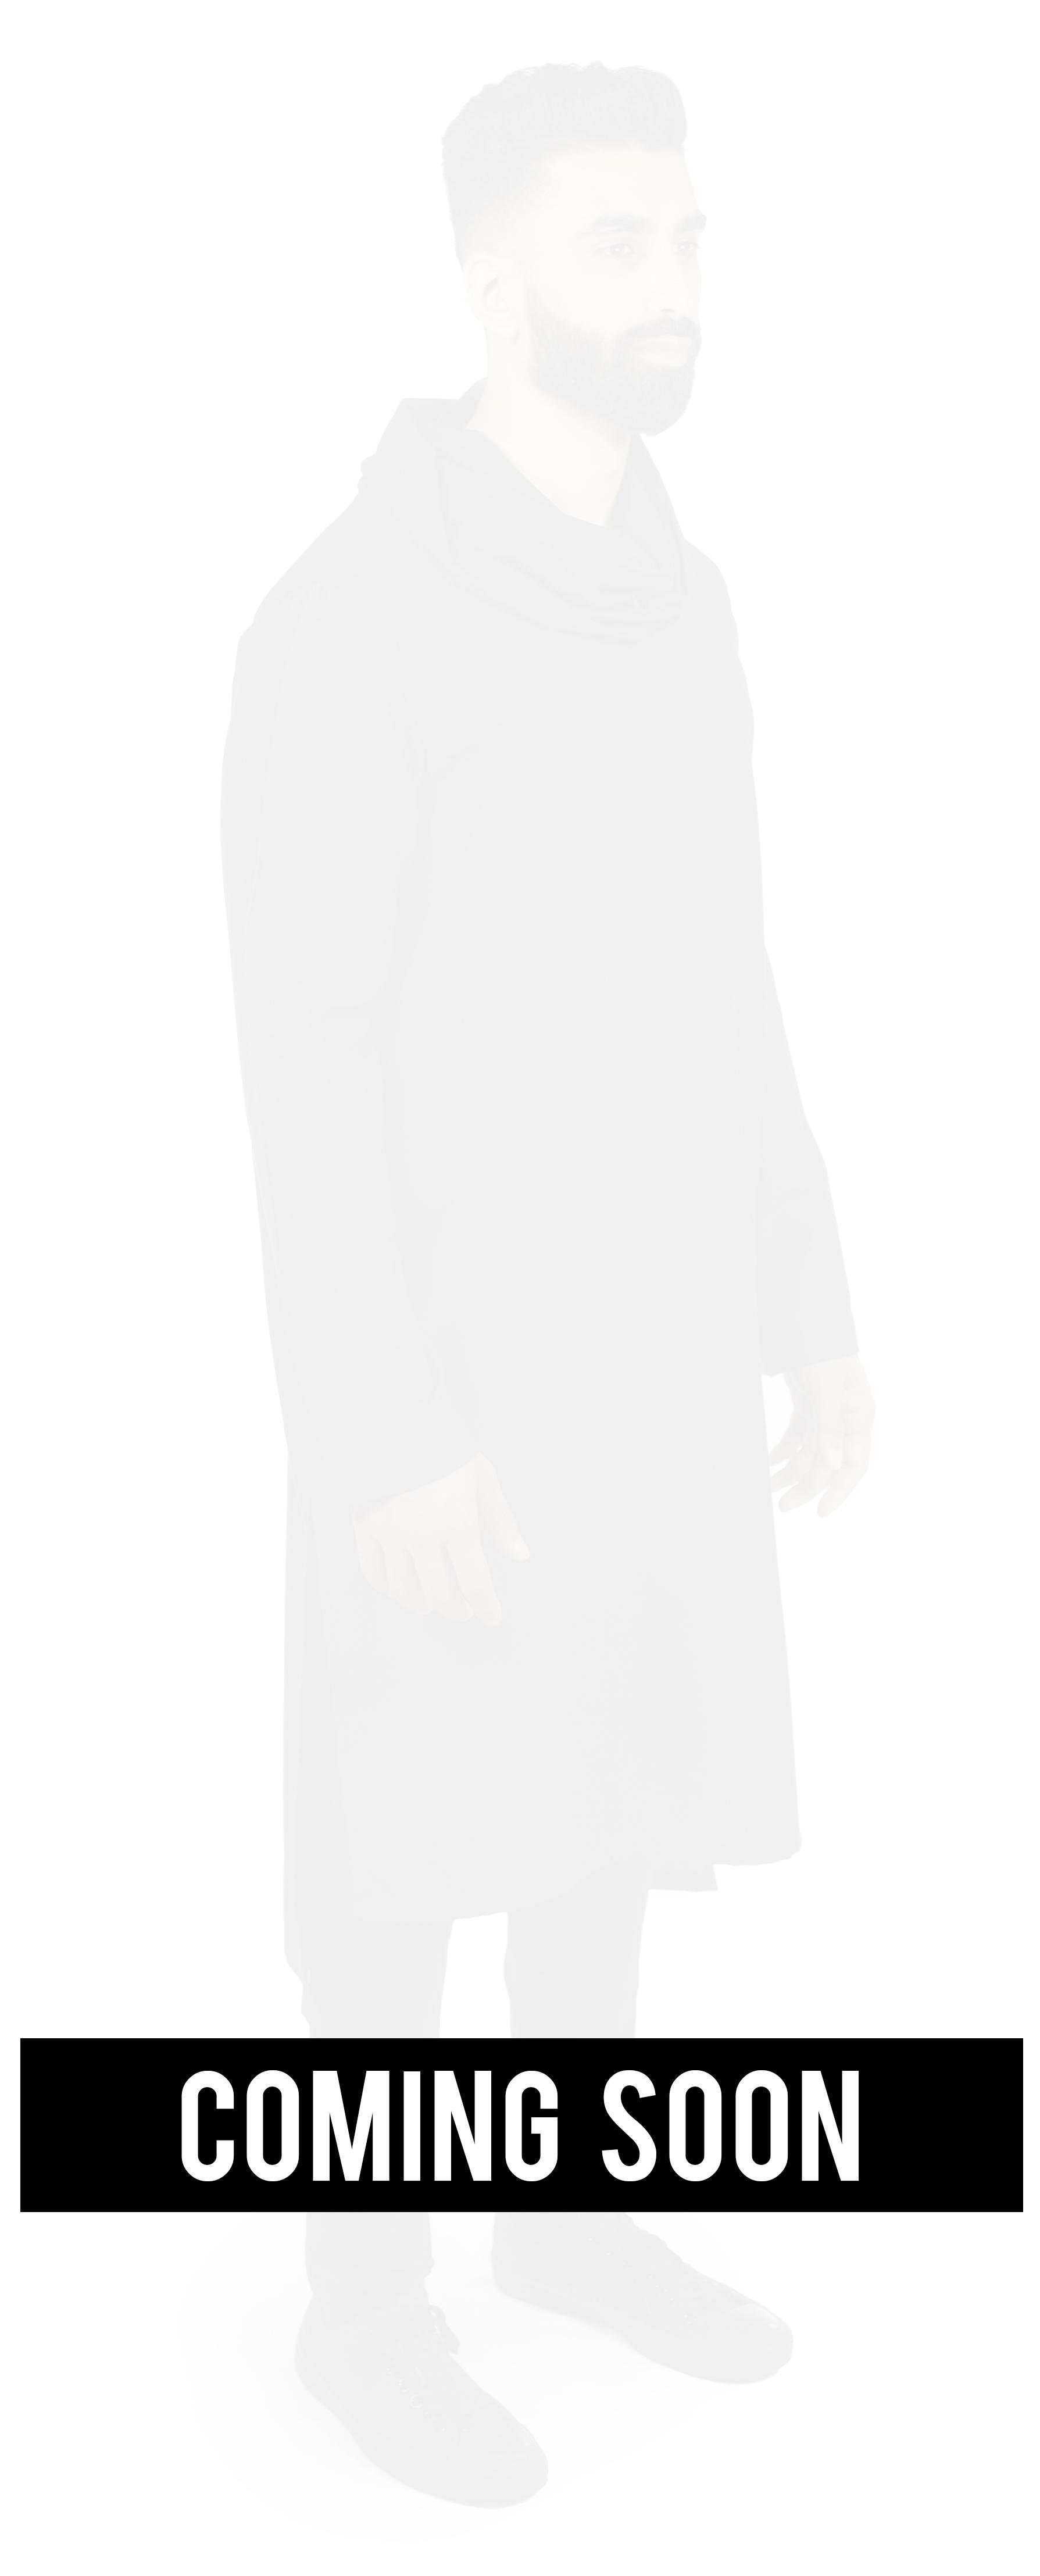 ARBI3A Coming Soon 2.jpg